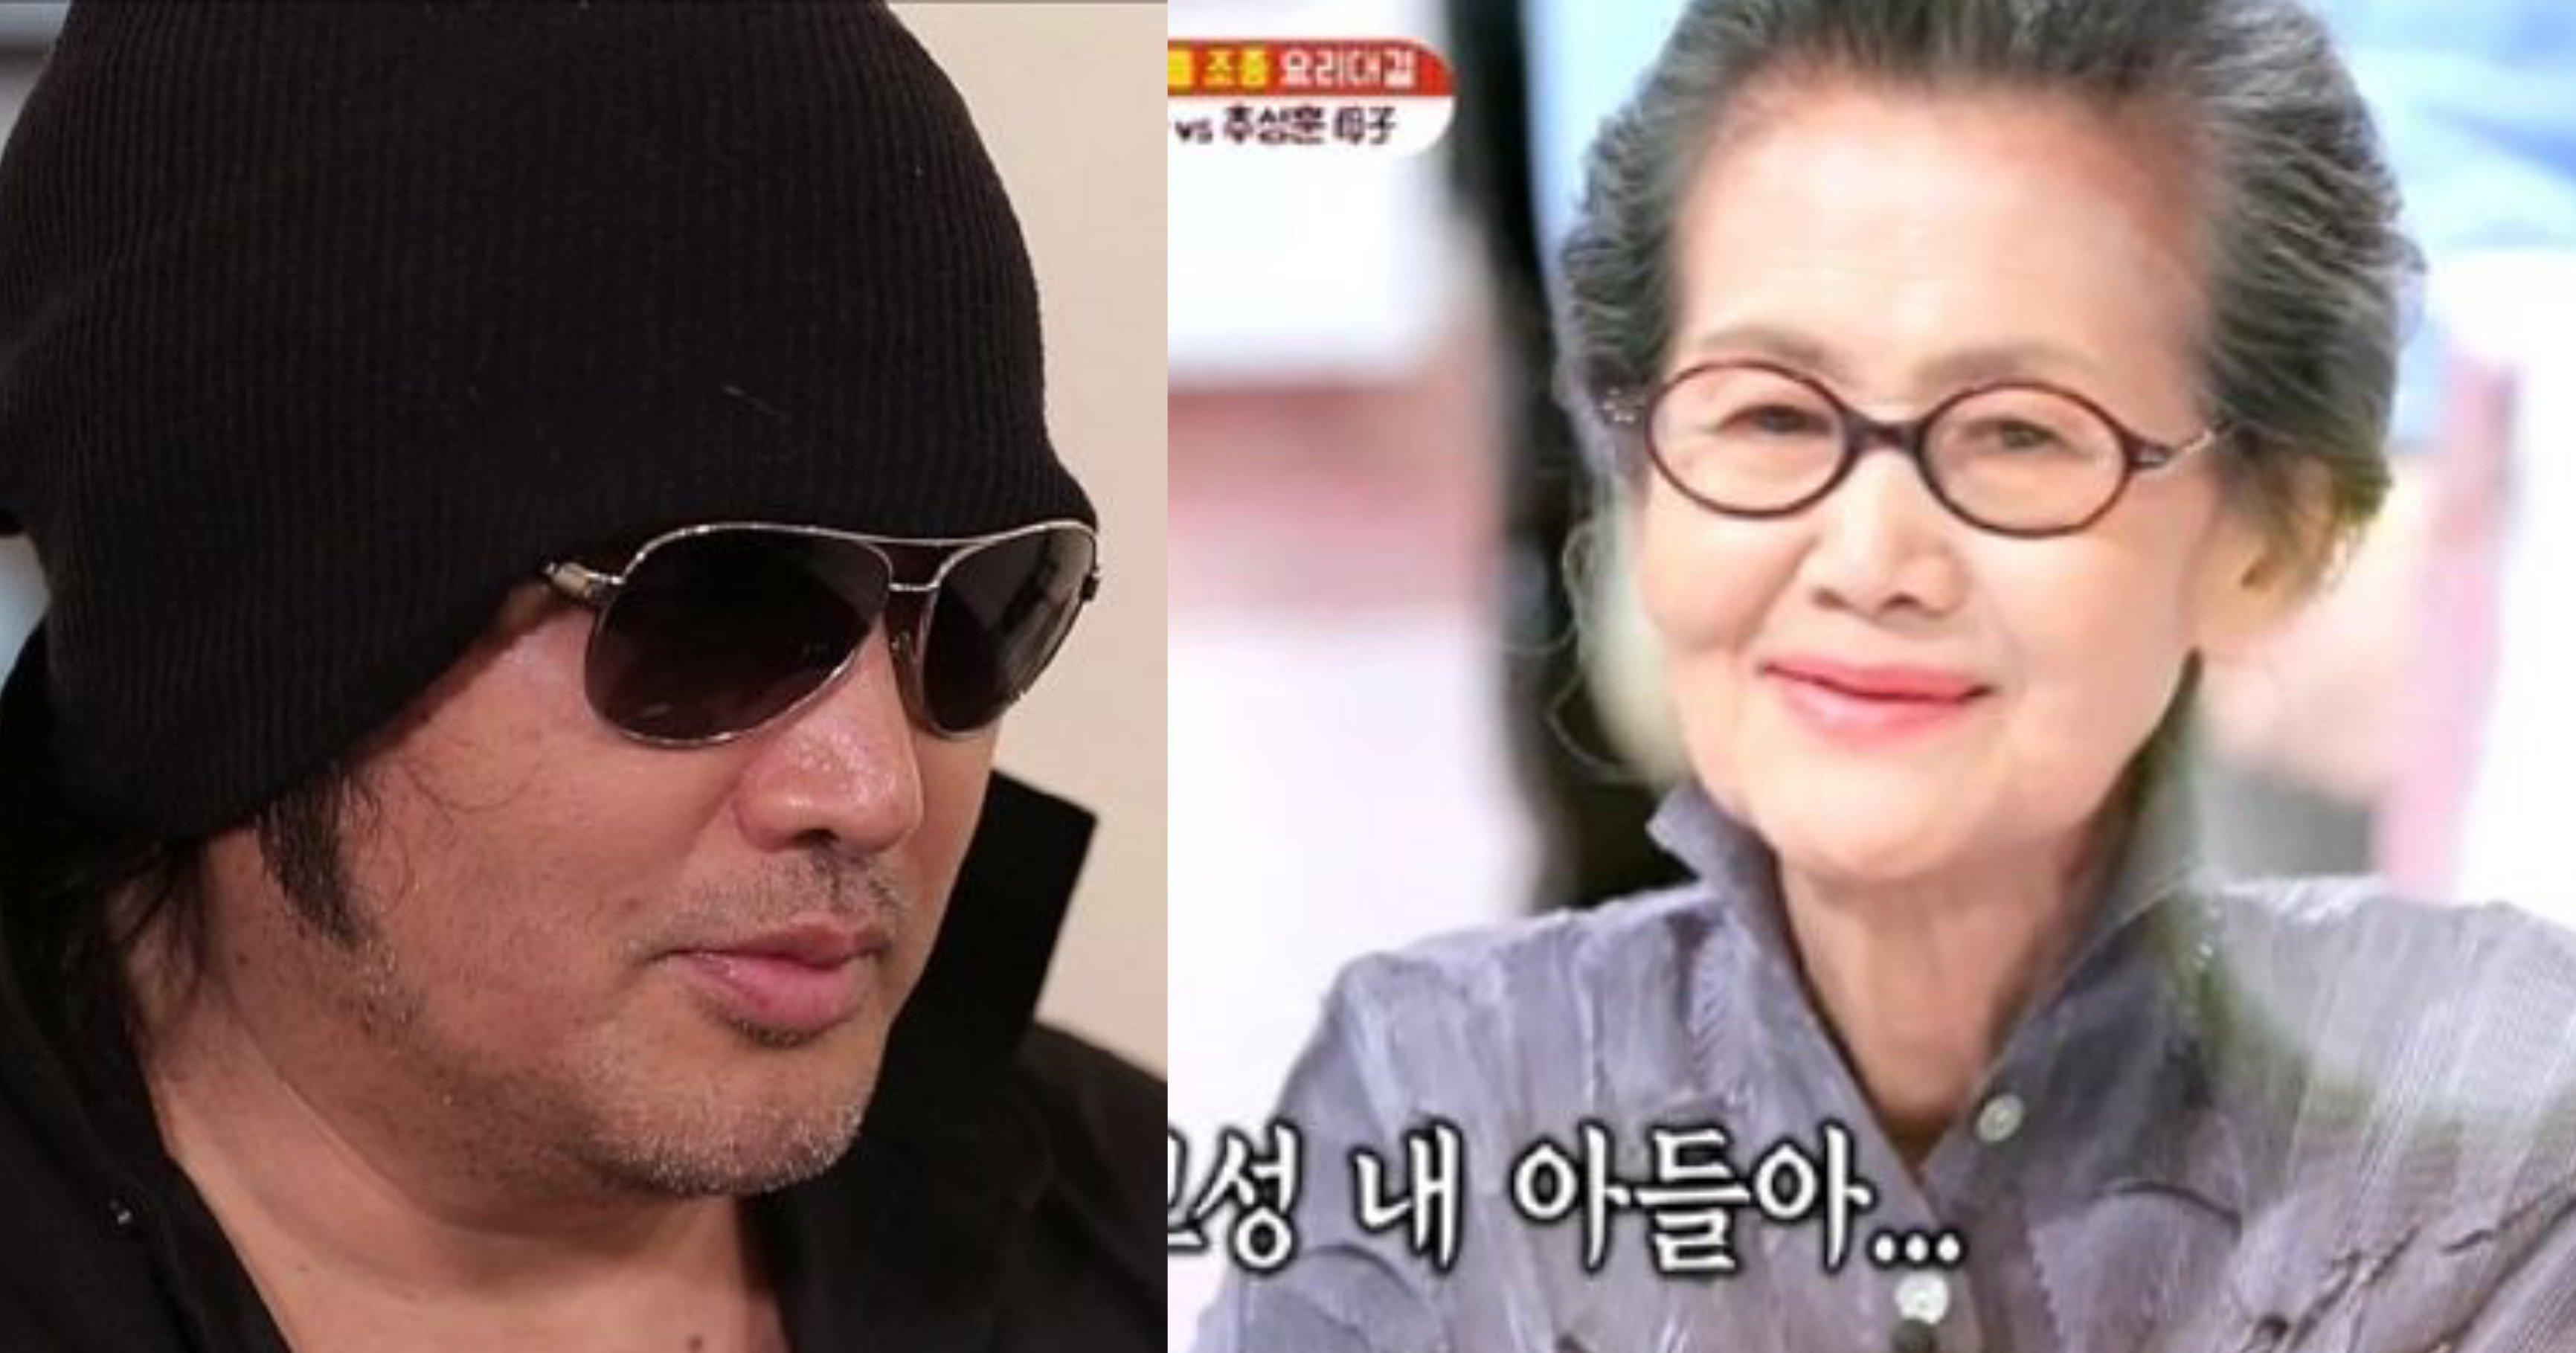 "eab980ebb3b4ec84b1 ec8db8eb84ac.jpg?resize=412,232 - ""어머니 죄송합니다....""....김보성이 방송에서 어머니 이야기를 하며 눈물 보인 이유"